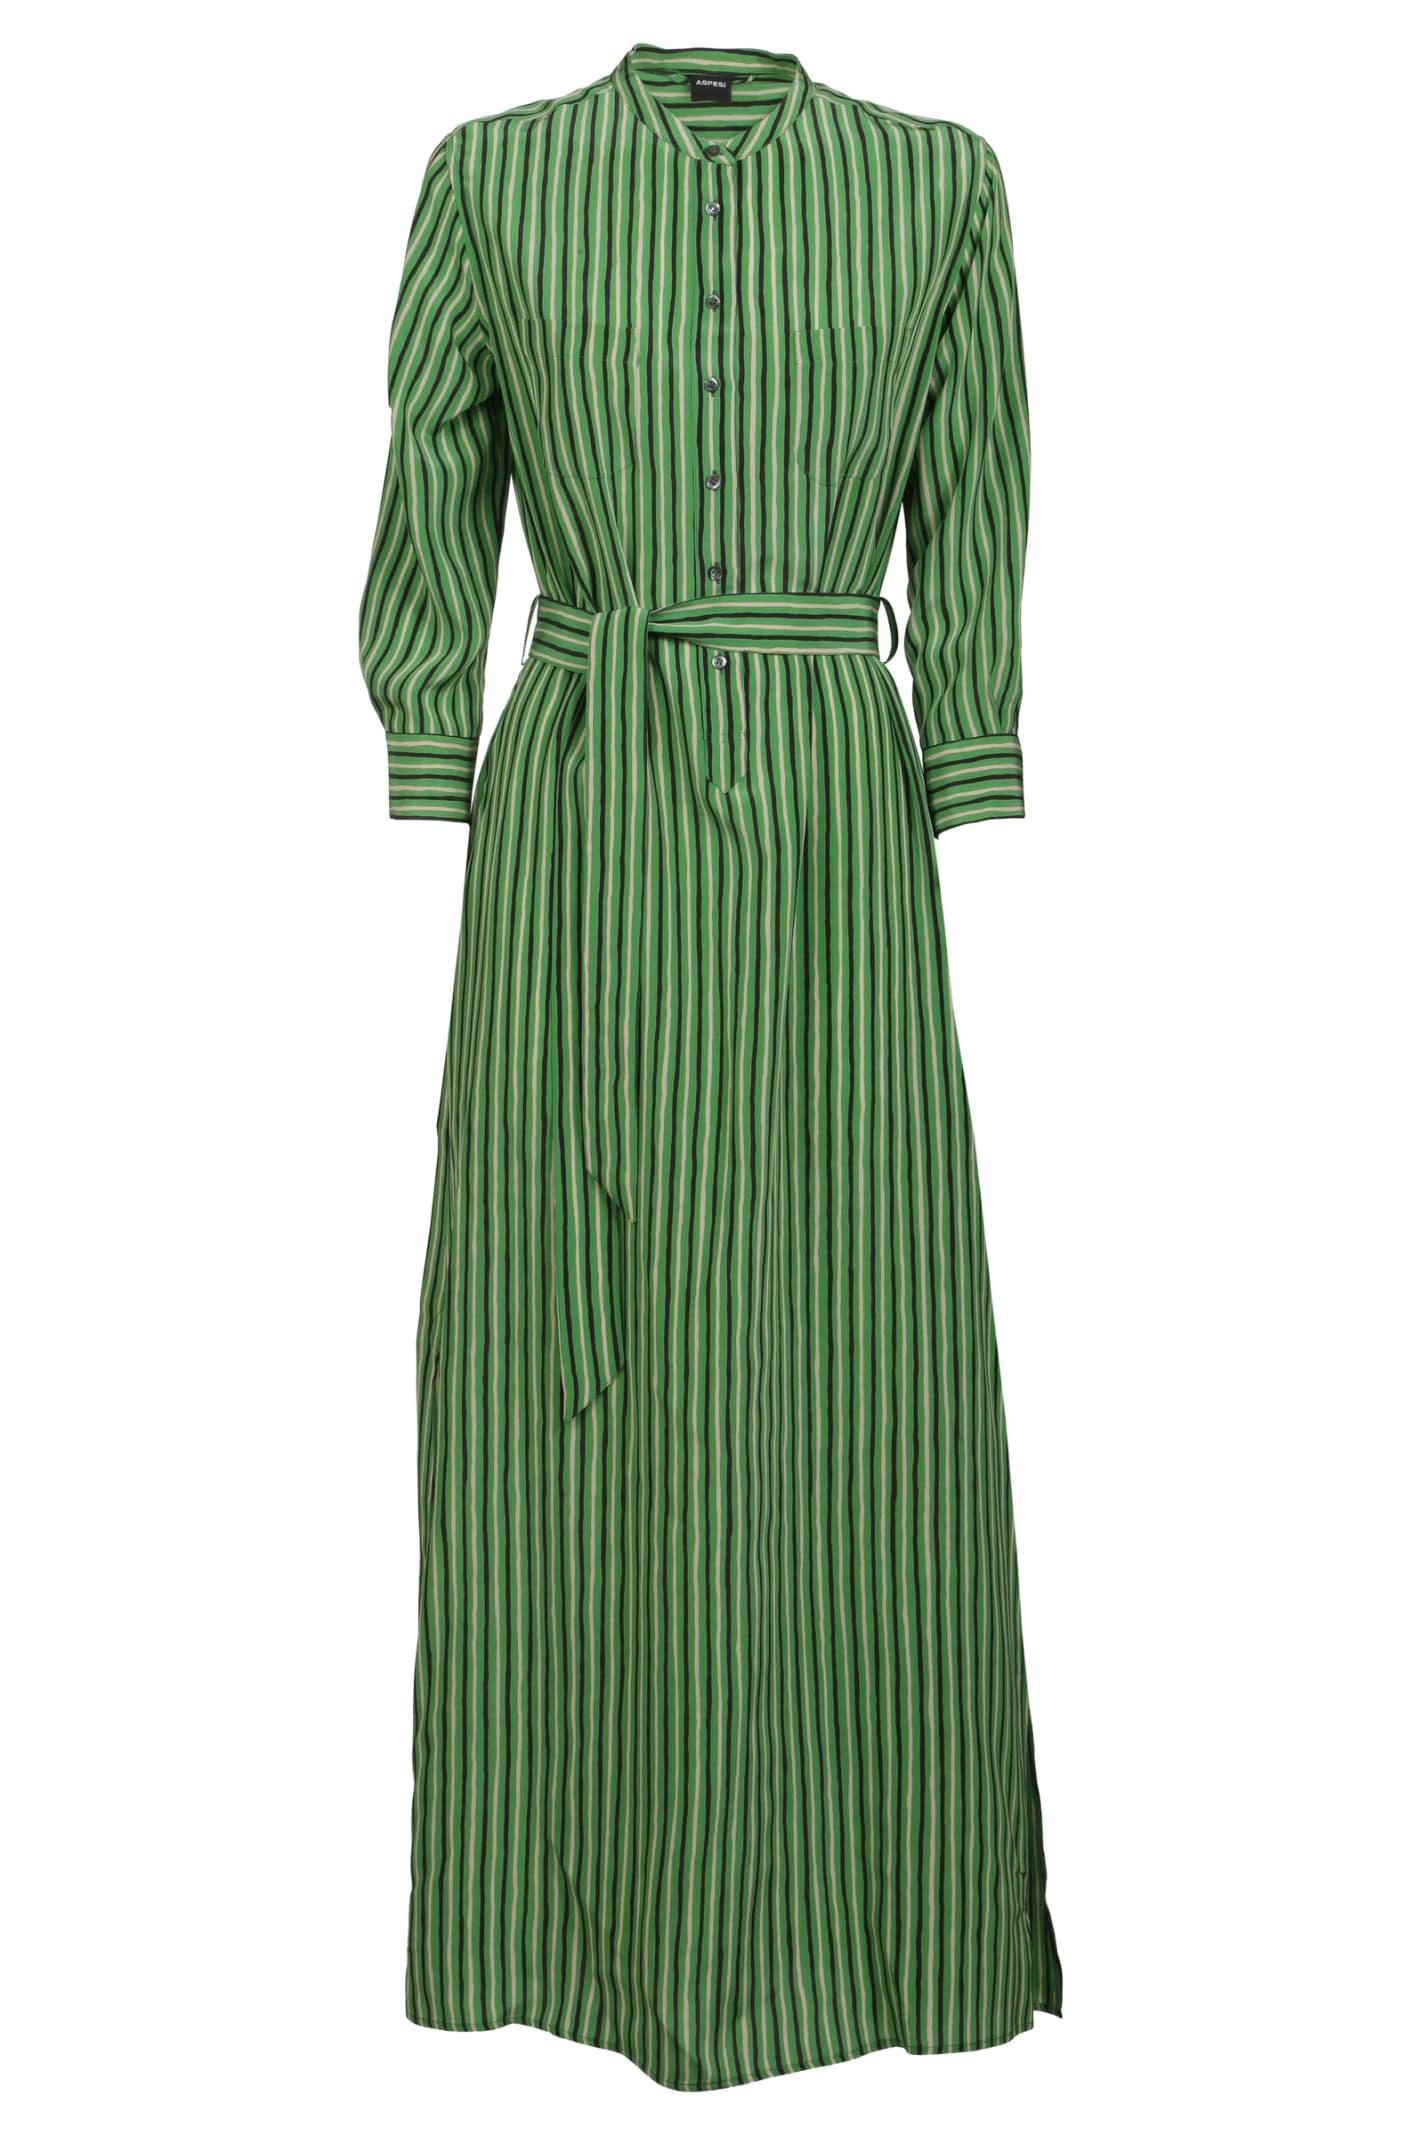 Aspesi Striped Dress